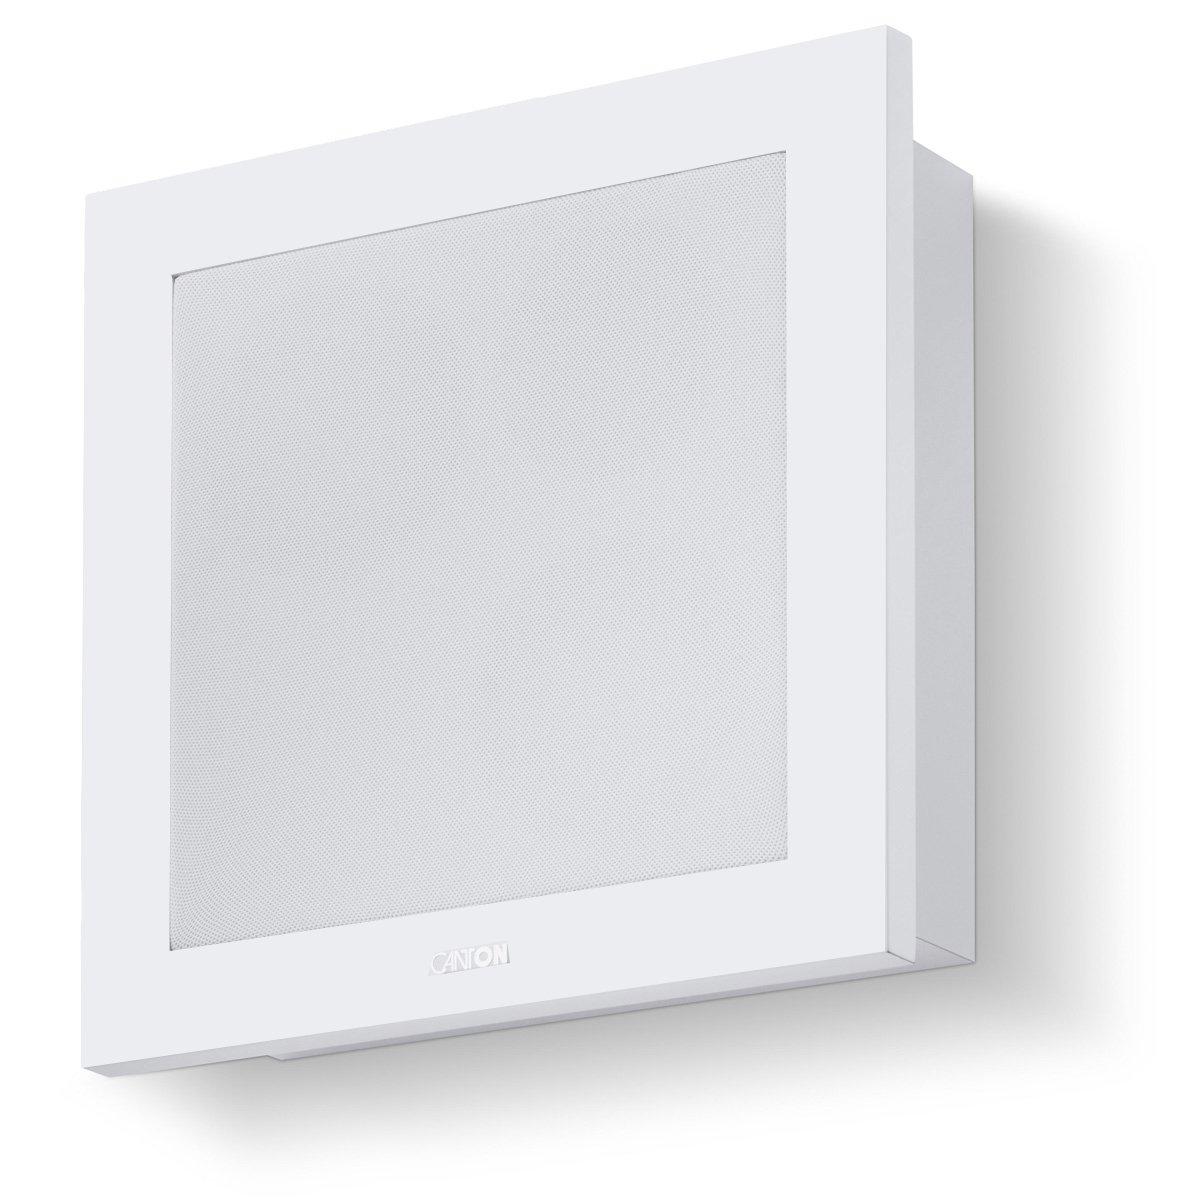 Canton 03484/Atelier 300/altoparlante satinata bianco